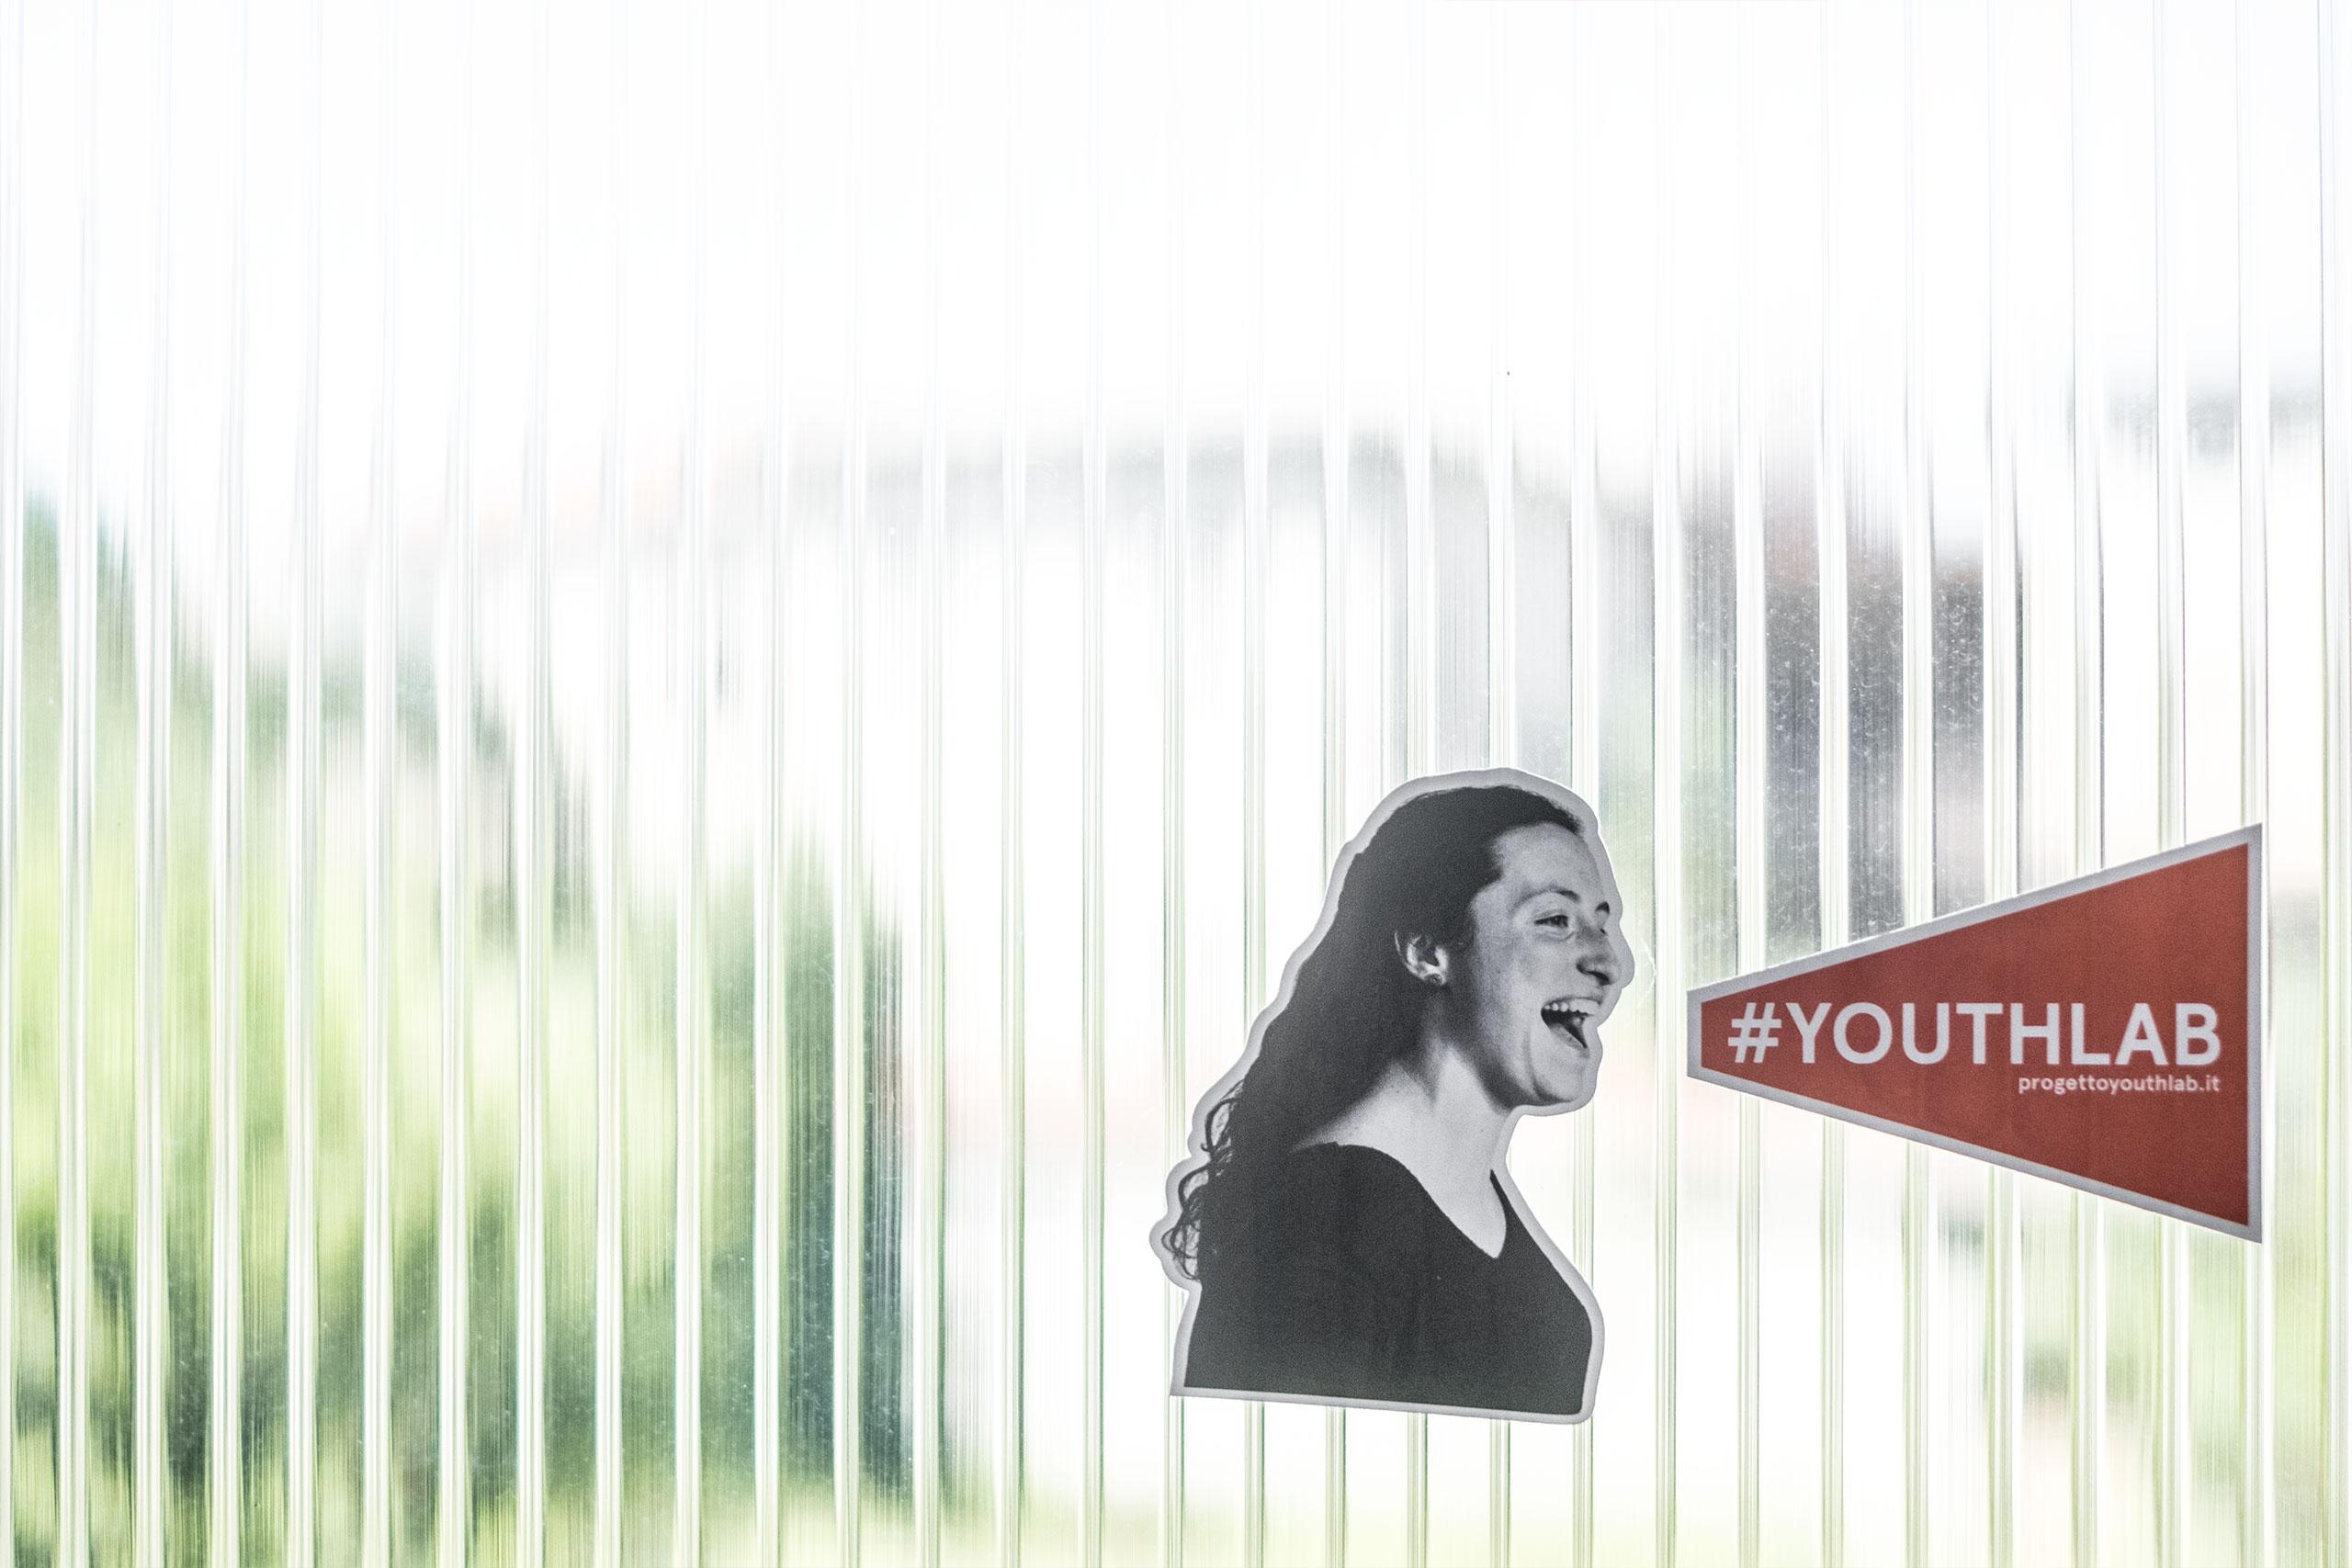 design logo campagna sociale youthlab